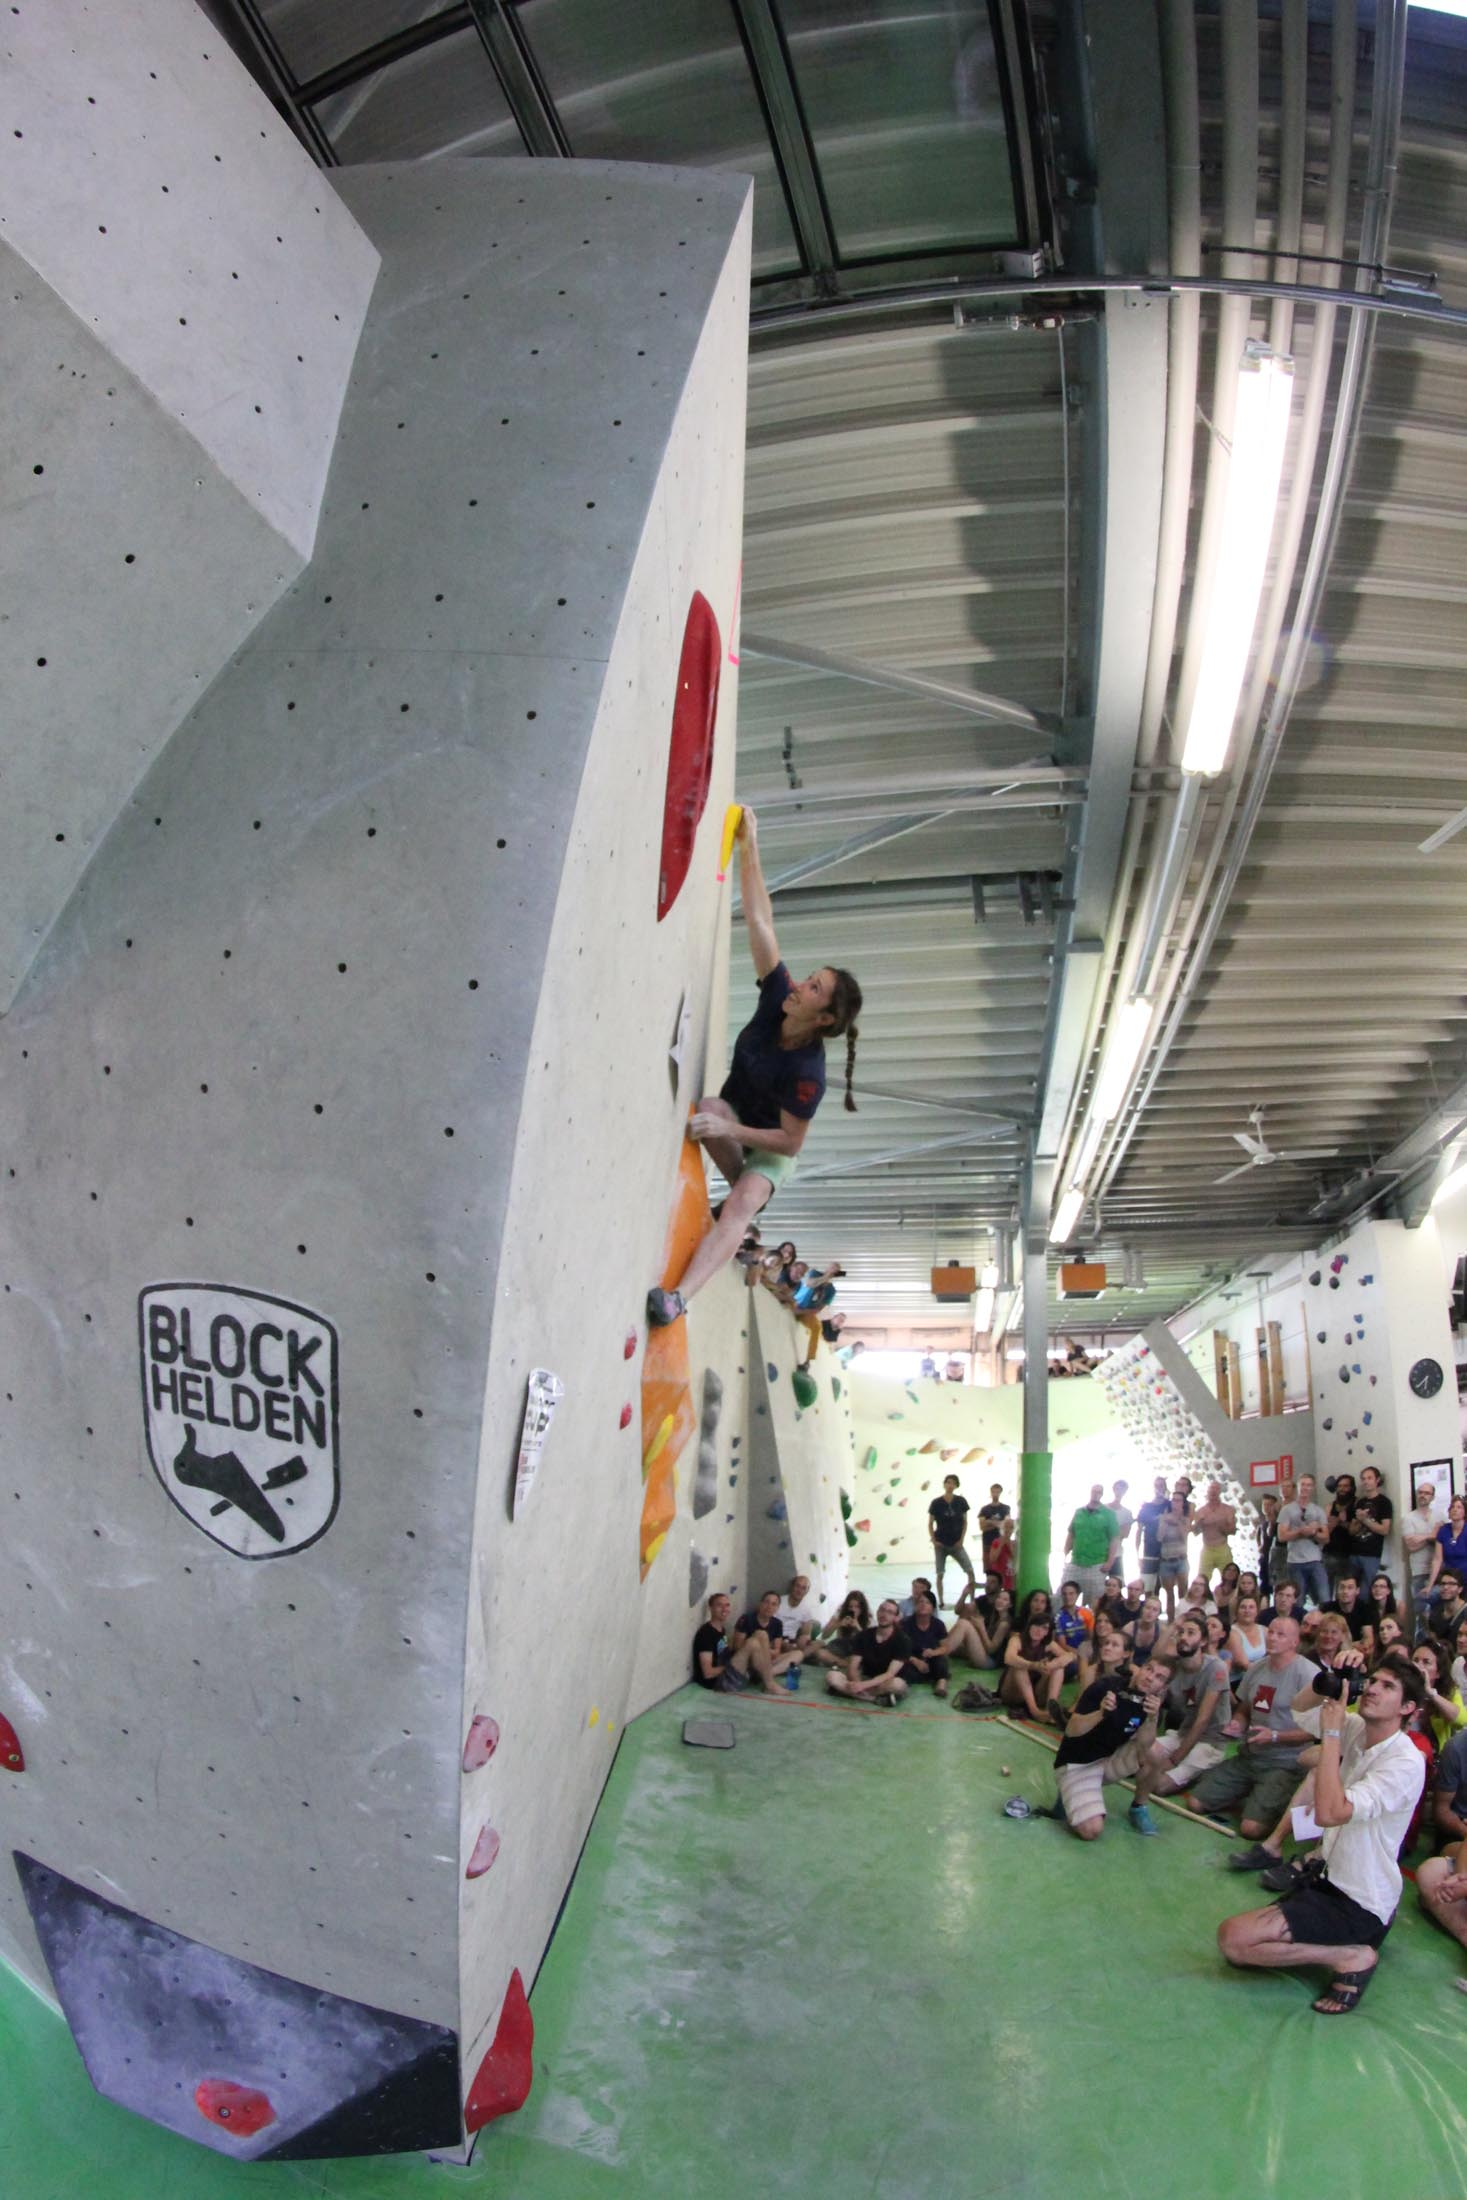 Finale, internationaler bouldercup Frankenjura 2016, BLOCKHELDEN Erlangen, Mammut, Bergfreunde.de, Boulderwettkampf07092016481